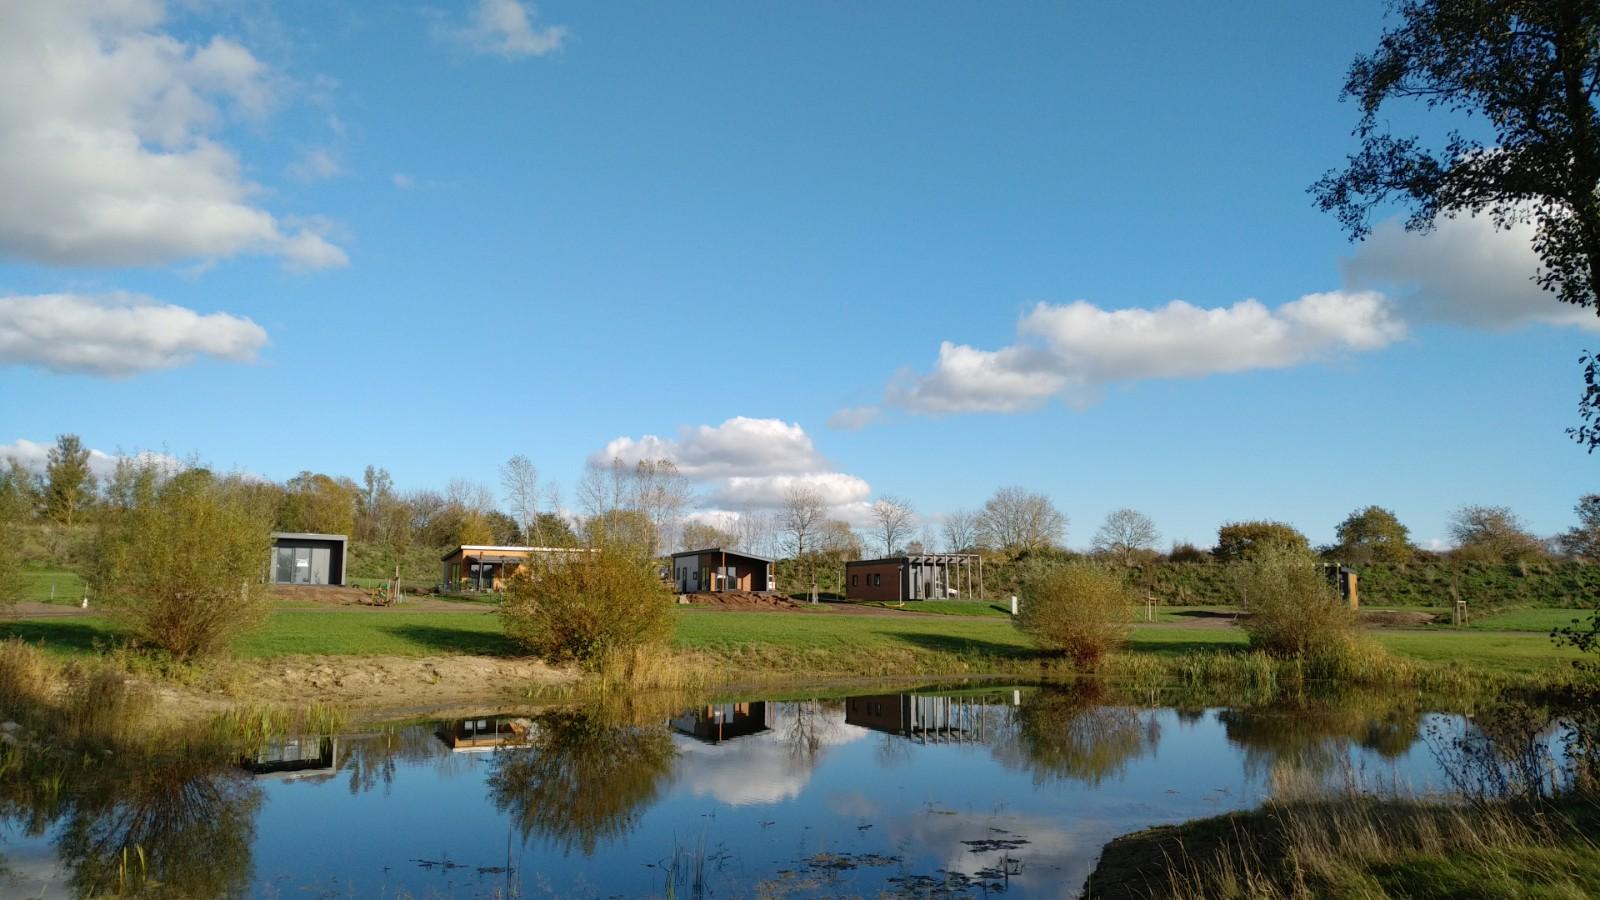 12. Panorama vom Seepark